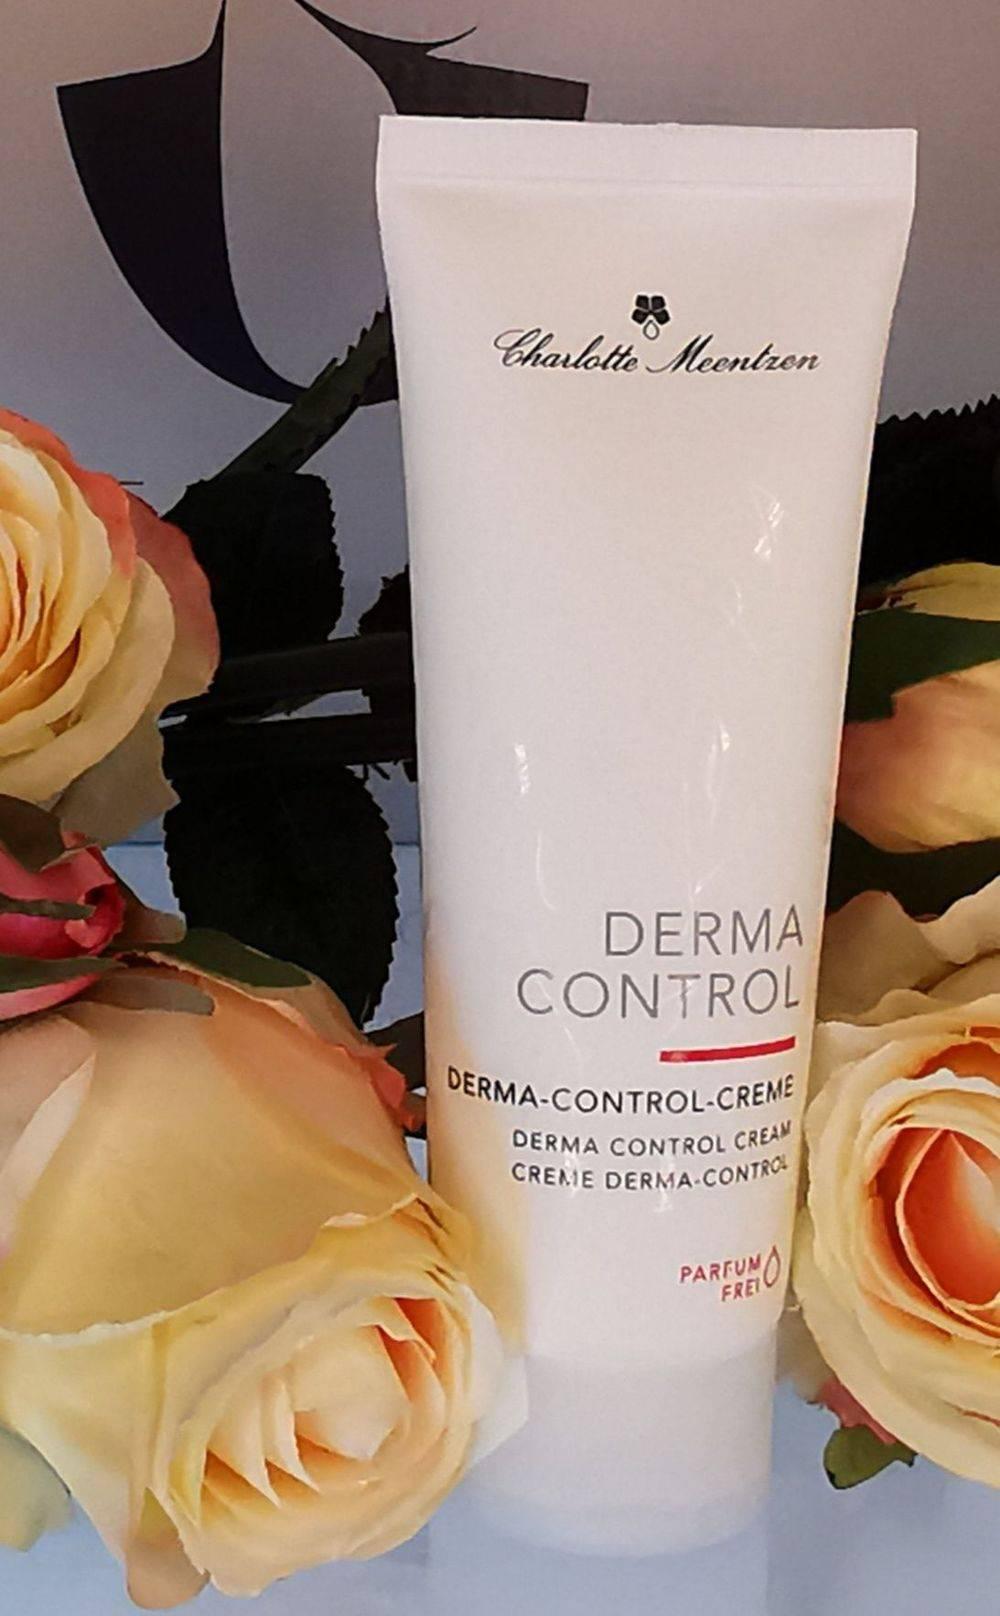 Derma Control Creme